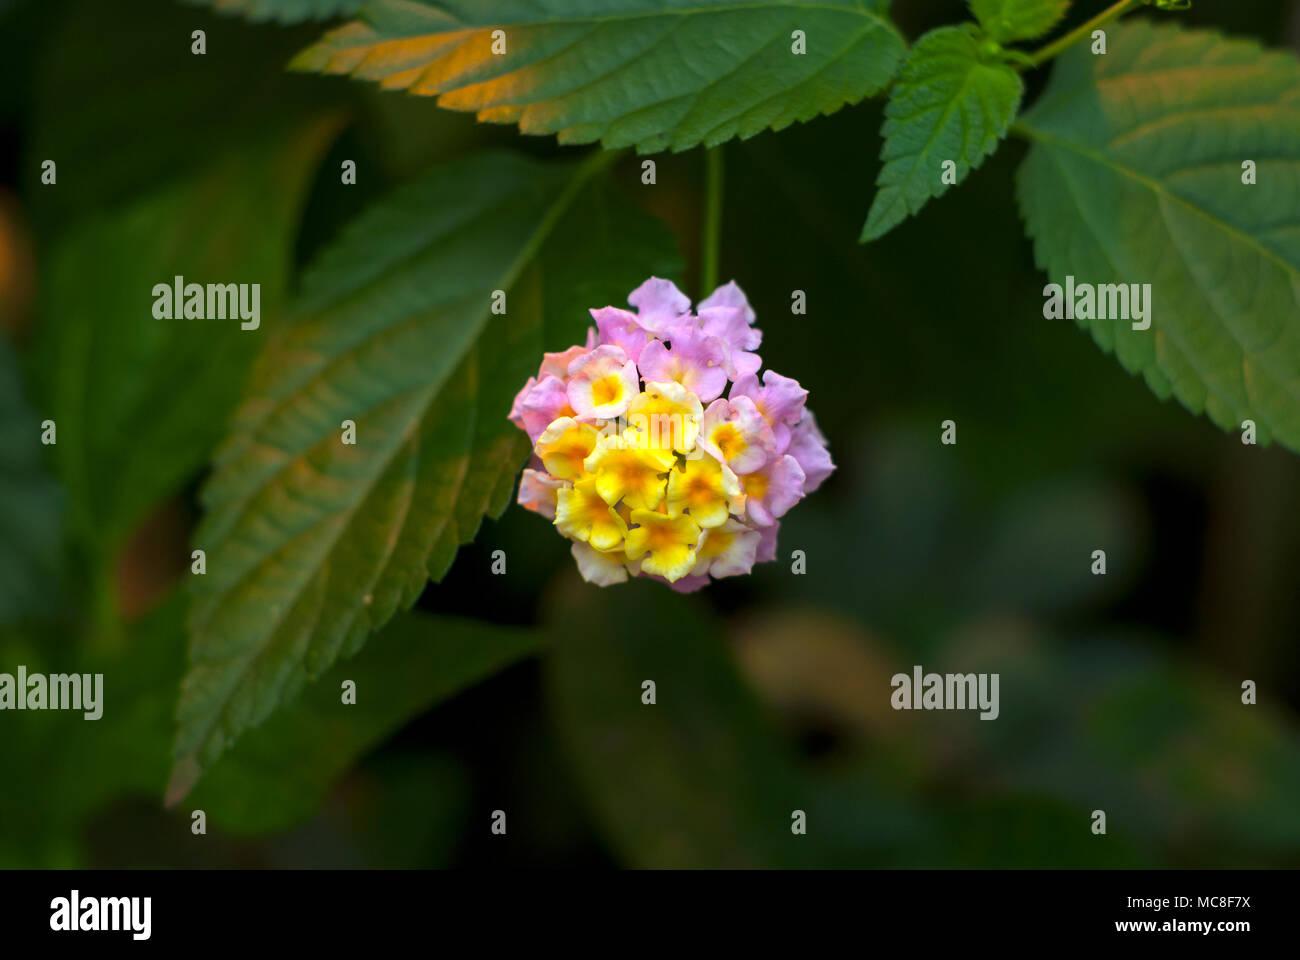 Beautiful Yellow Pink Inflorescence Of A Tropical Flower Lantana